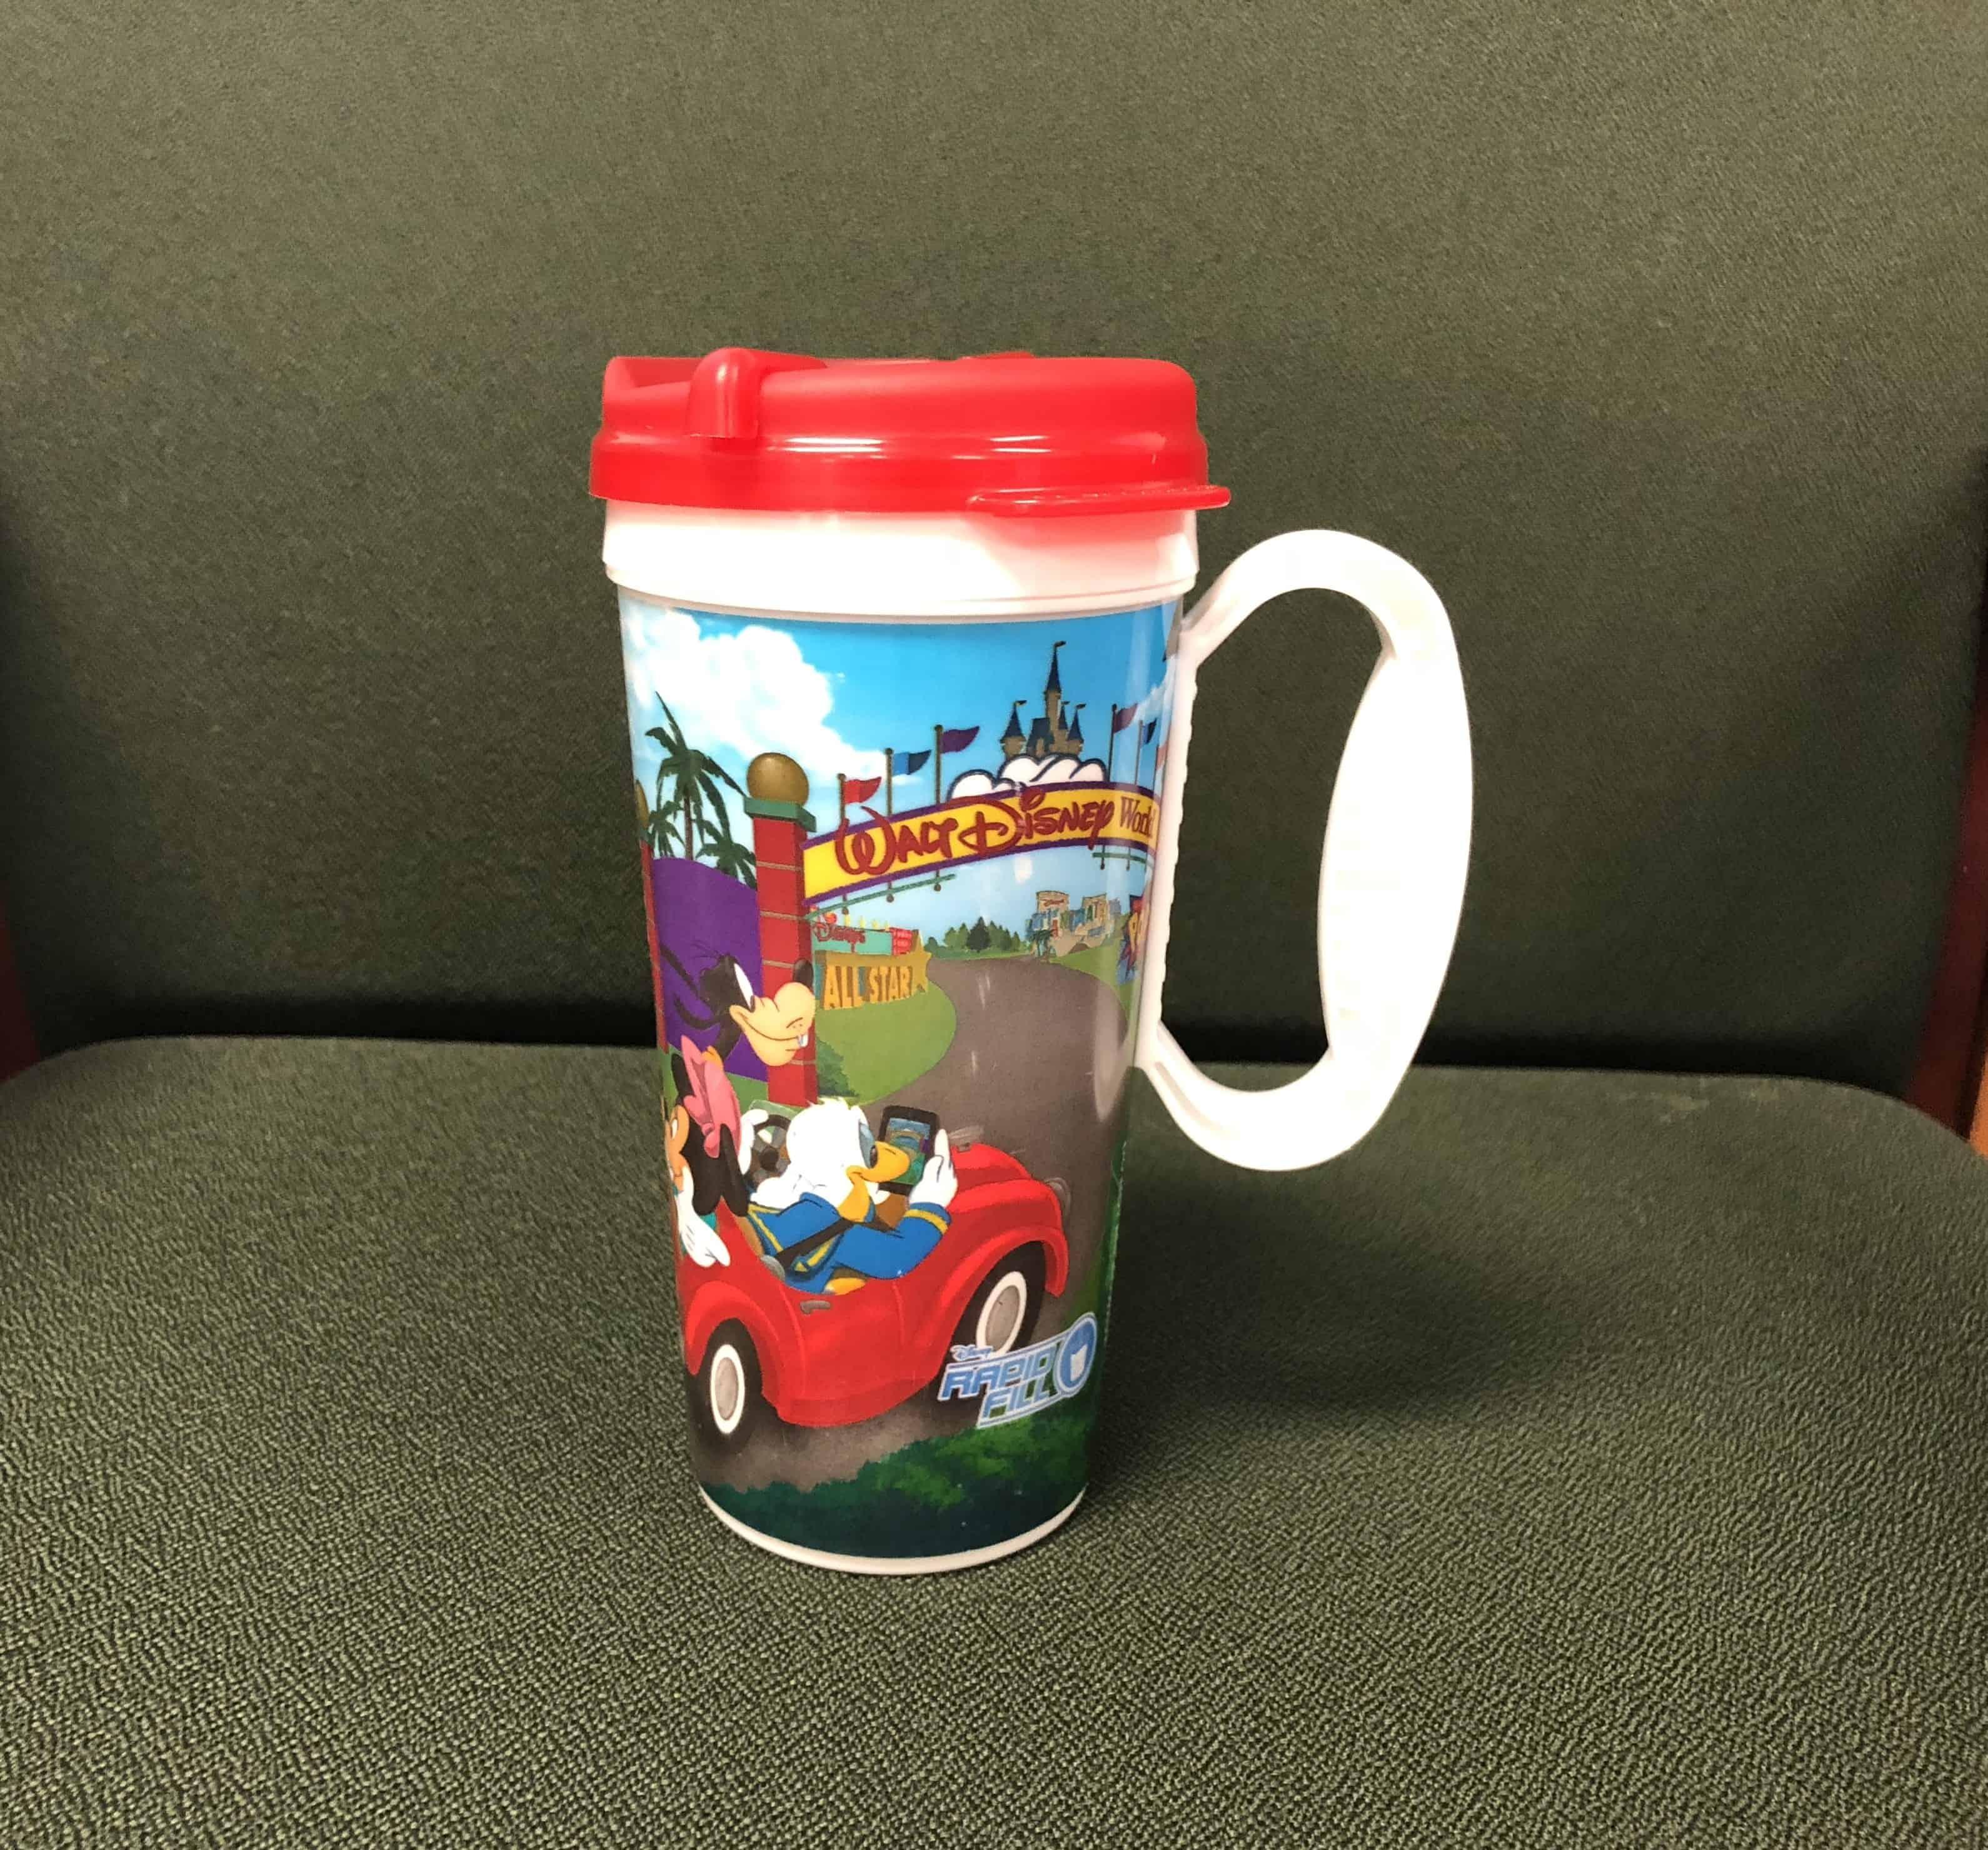 disney refillable mug 2018